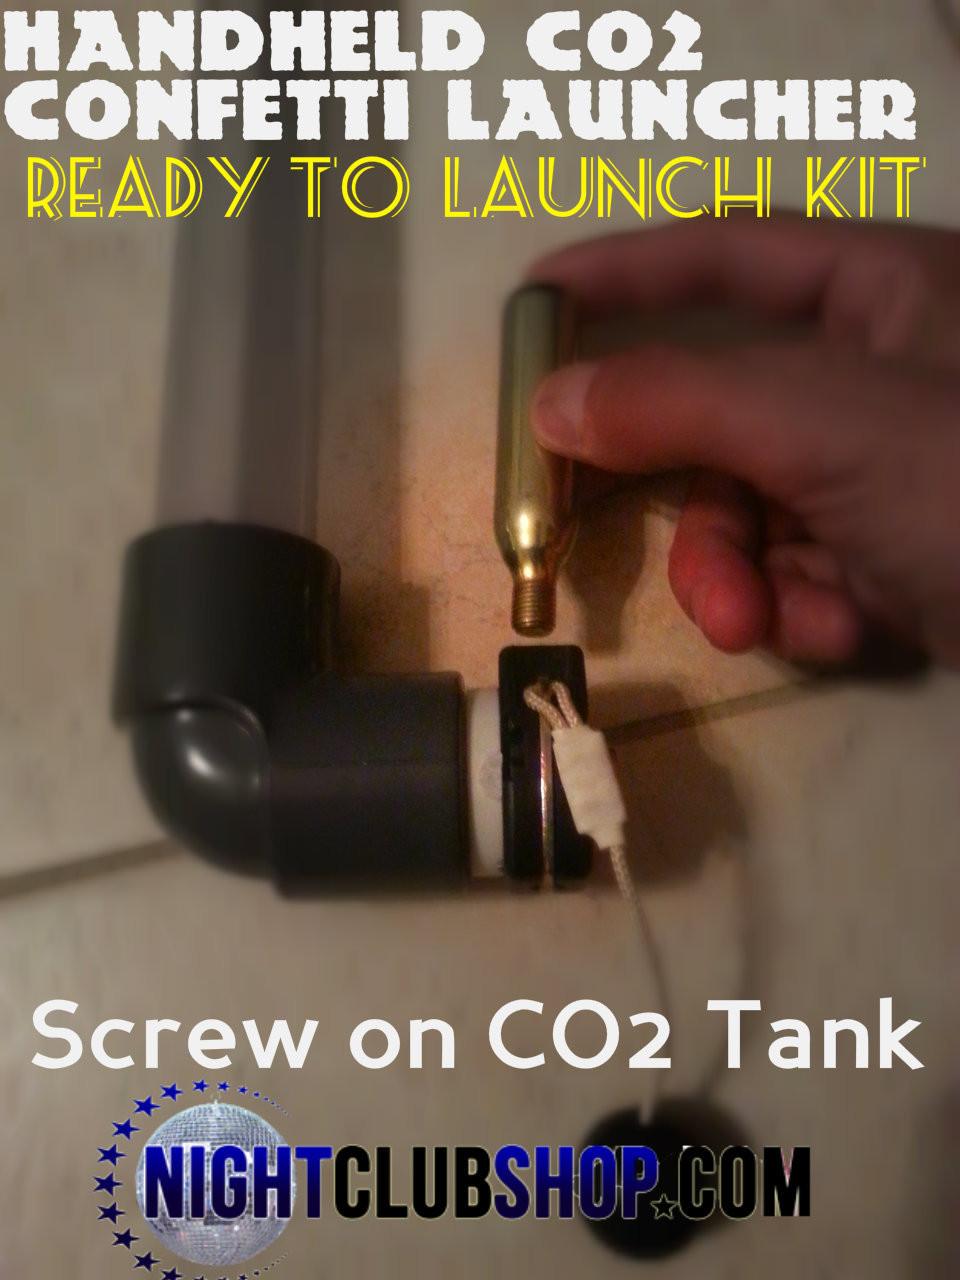 Easy to use, fast, load, confetti,streamer, launcher, gun, blaster, handheld